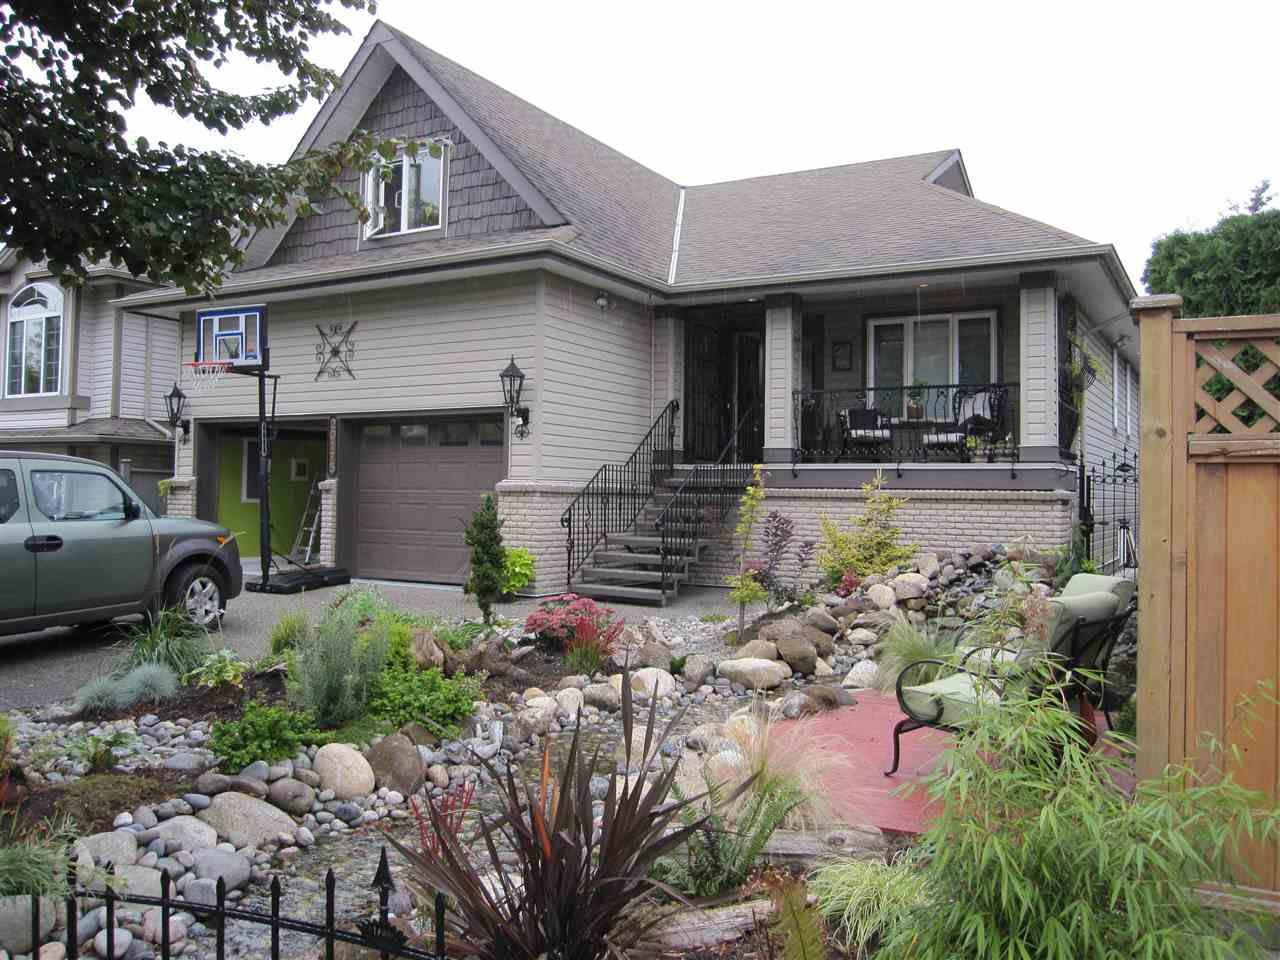 Main Photo: 20175 TELEP Avenue in Maple Ridge: Northwest Maple Ridge House for sale : MLS®# R2112255